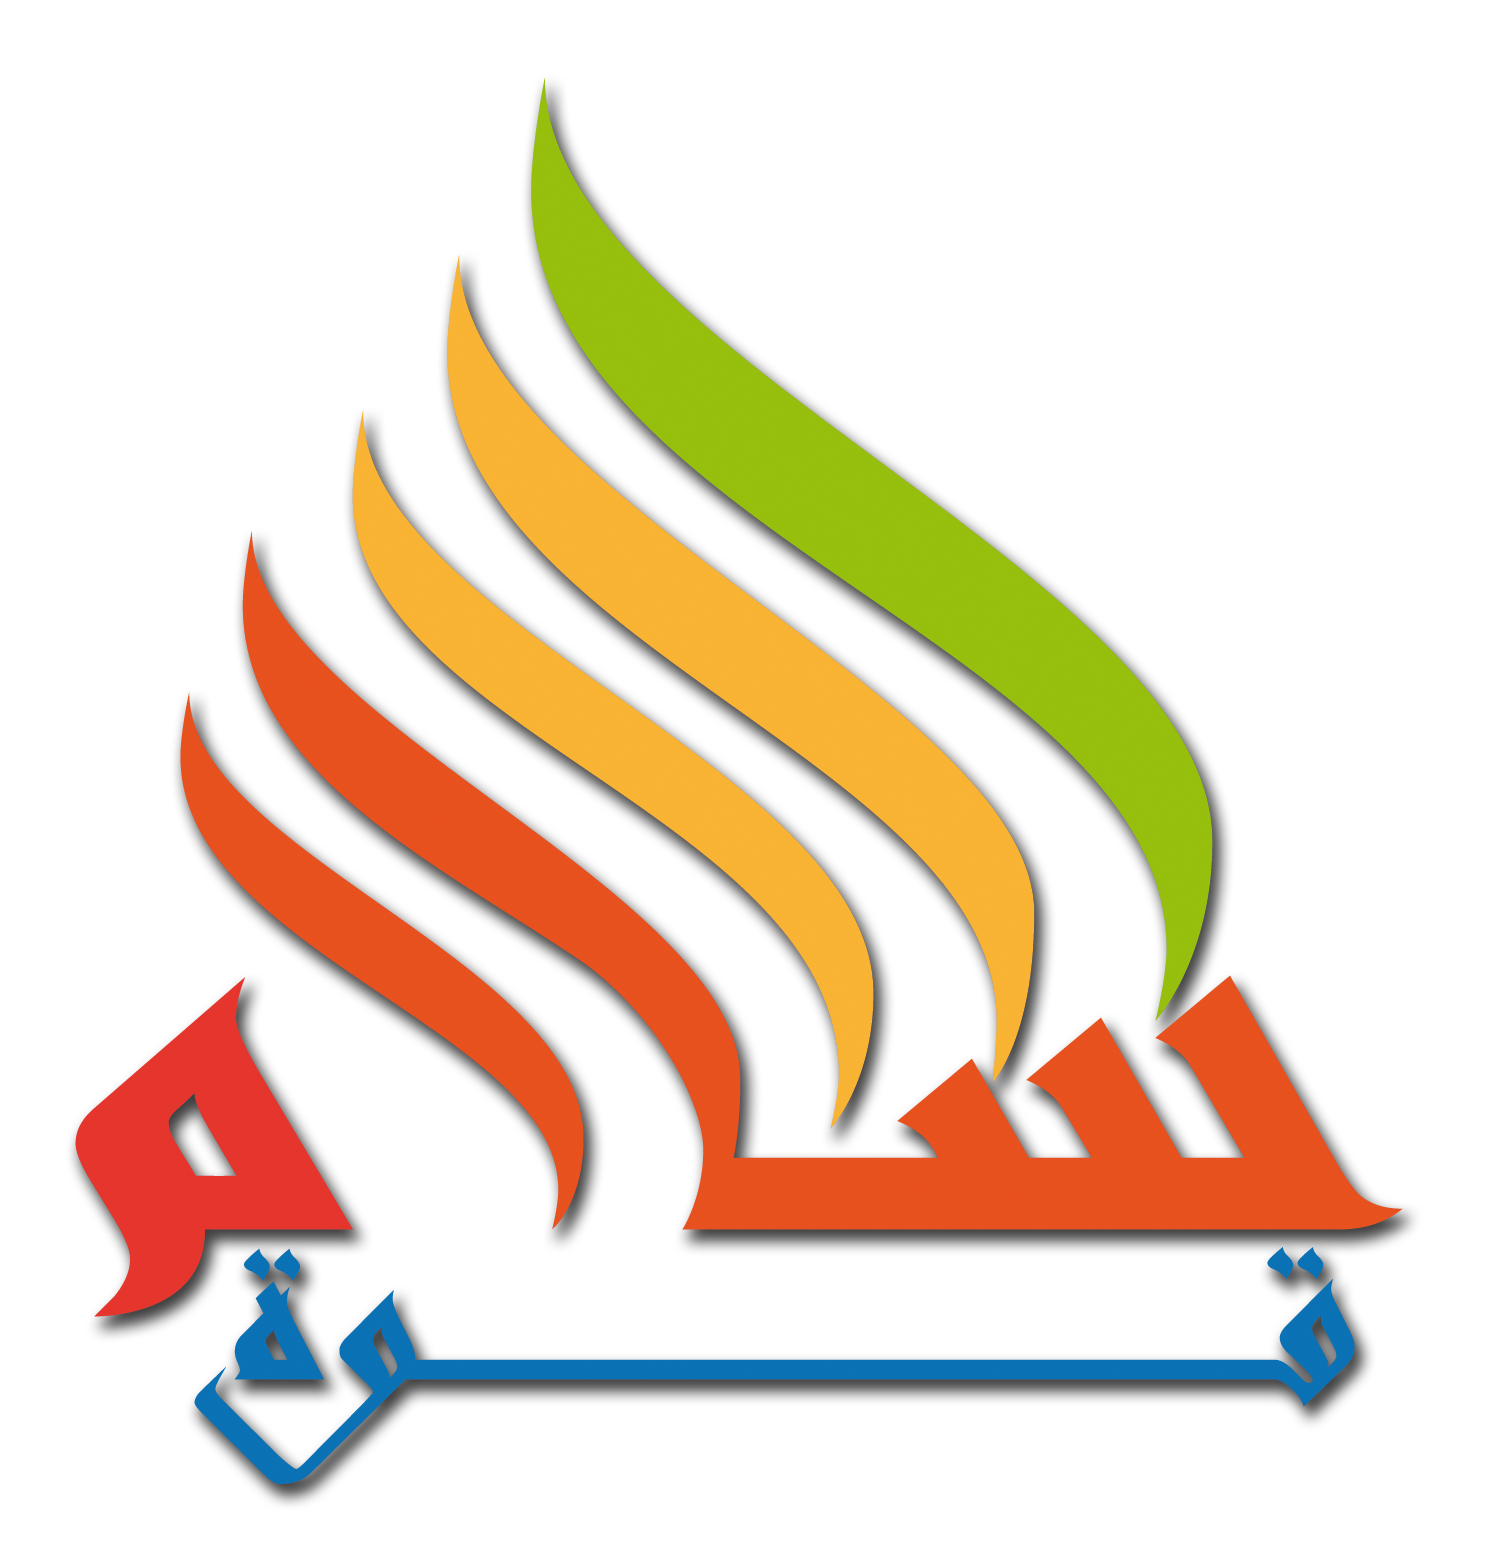 Moulana Khalid ibrahim